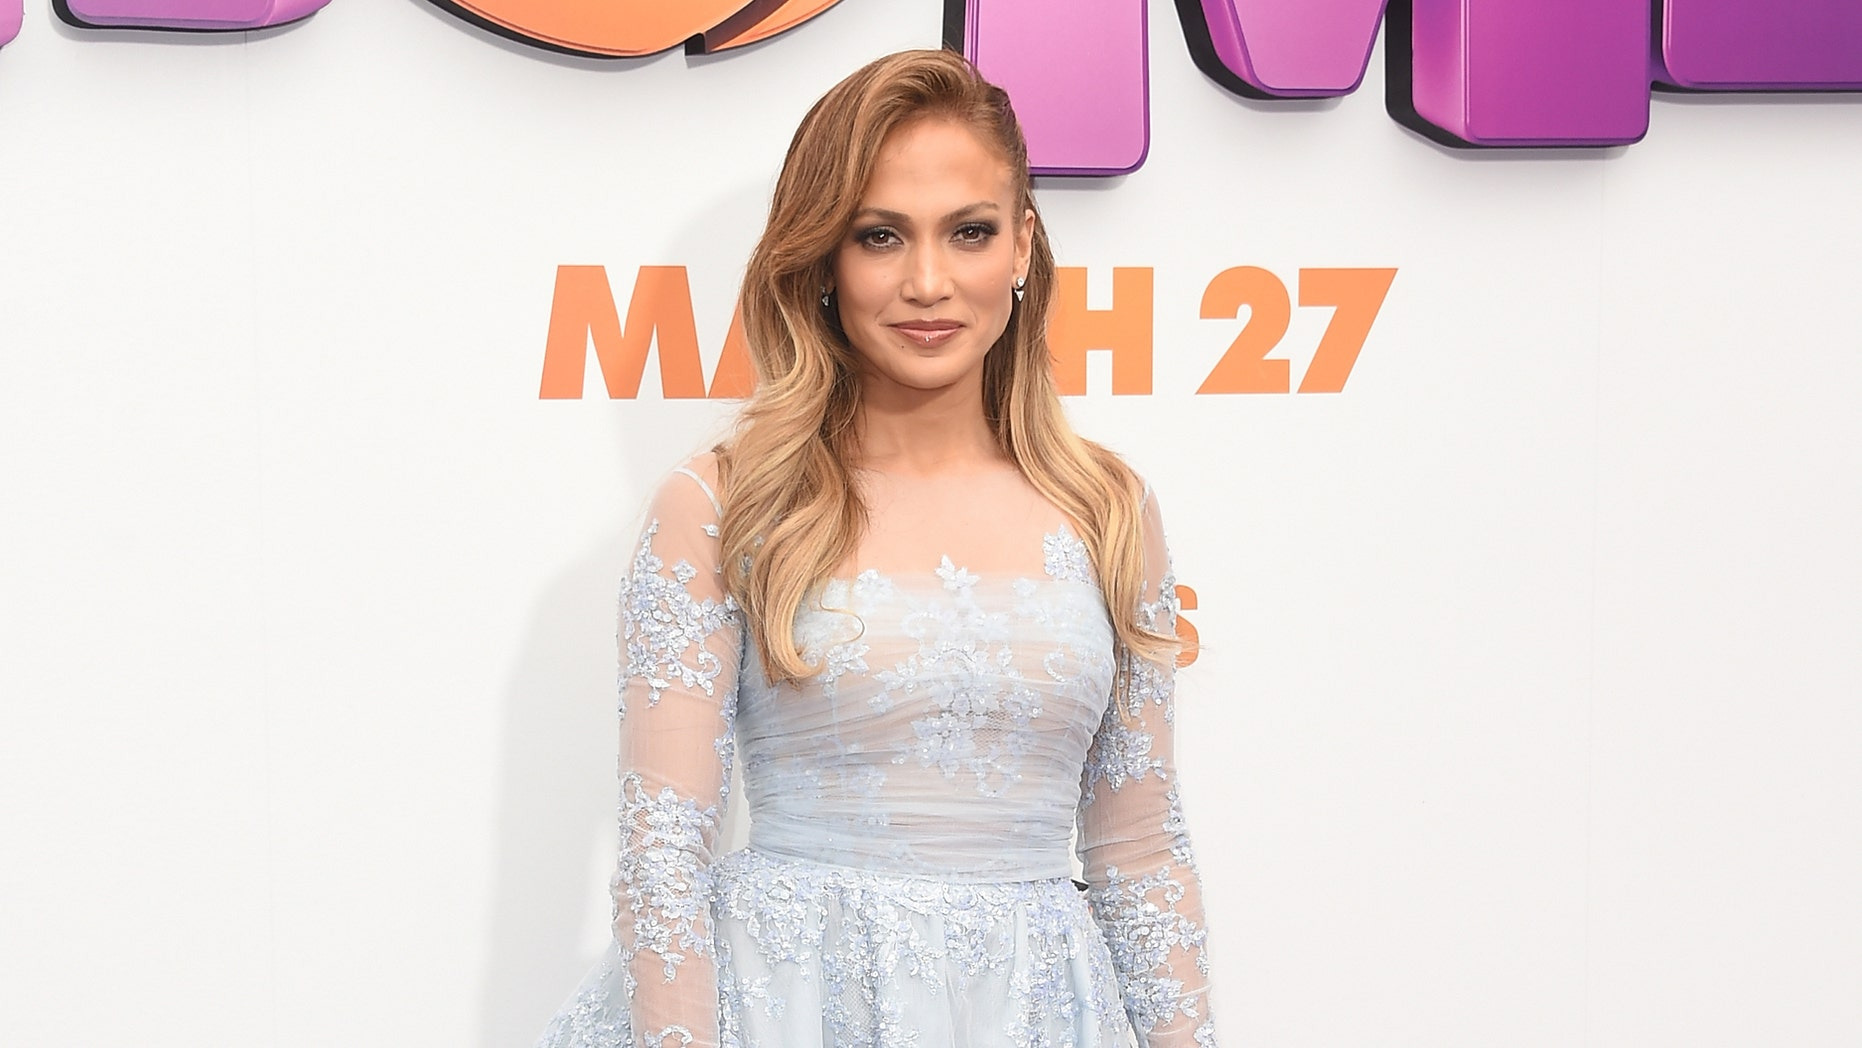 Jennifer Lopez at Regency Village Theatre on March 22, 2015 in Westwood, California.